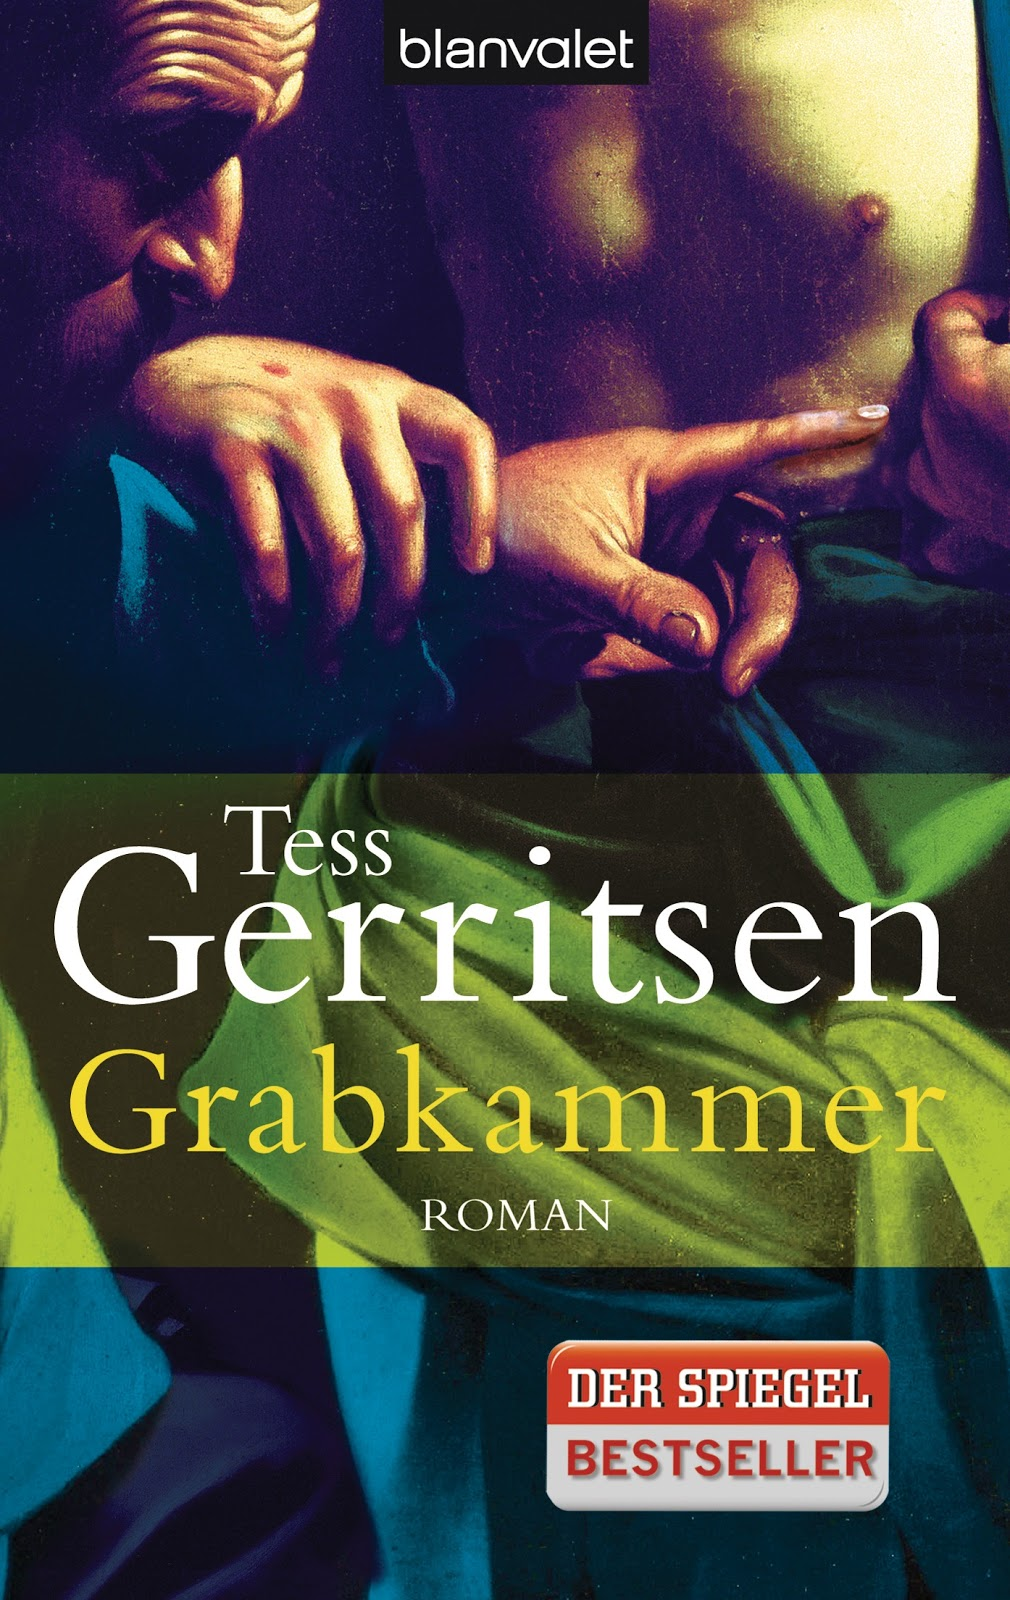 http://www.randomhouse.de/Presse/Taschenbuch/Grabkammer-Roman/Tess-Gerritsen/pr275606.rhd?men=1&pub=1000